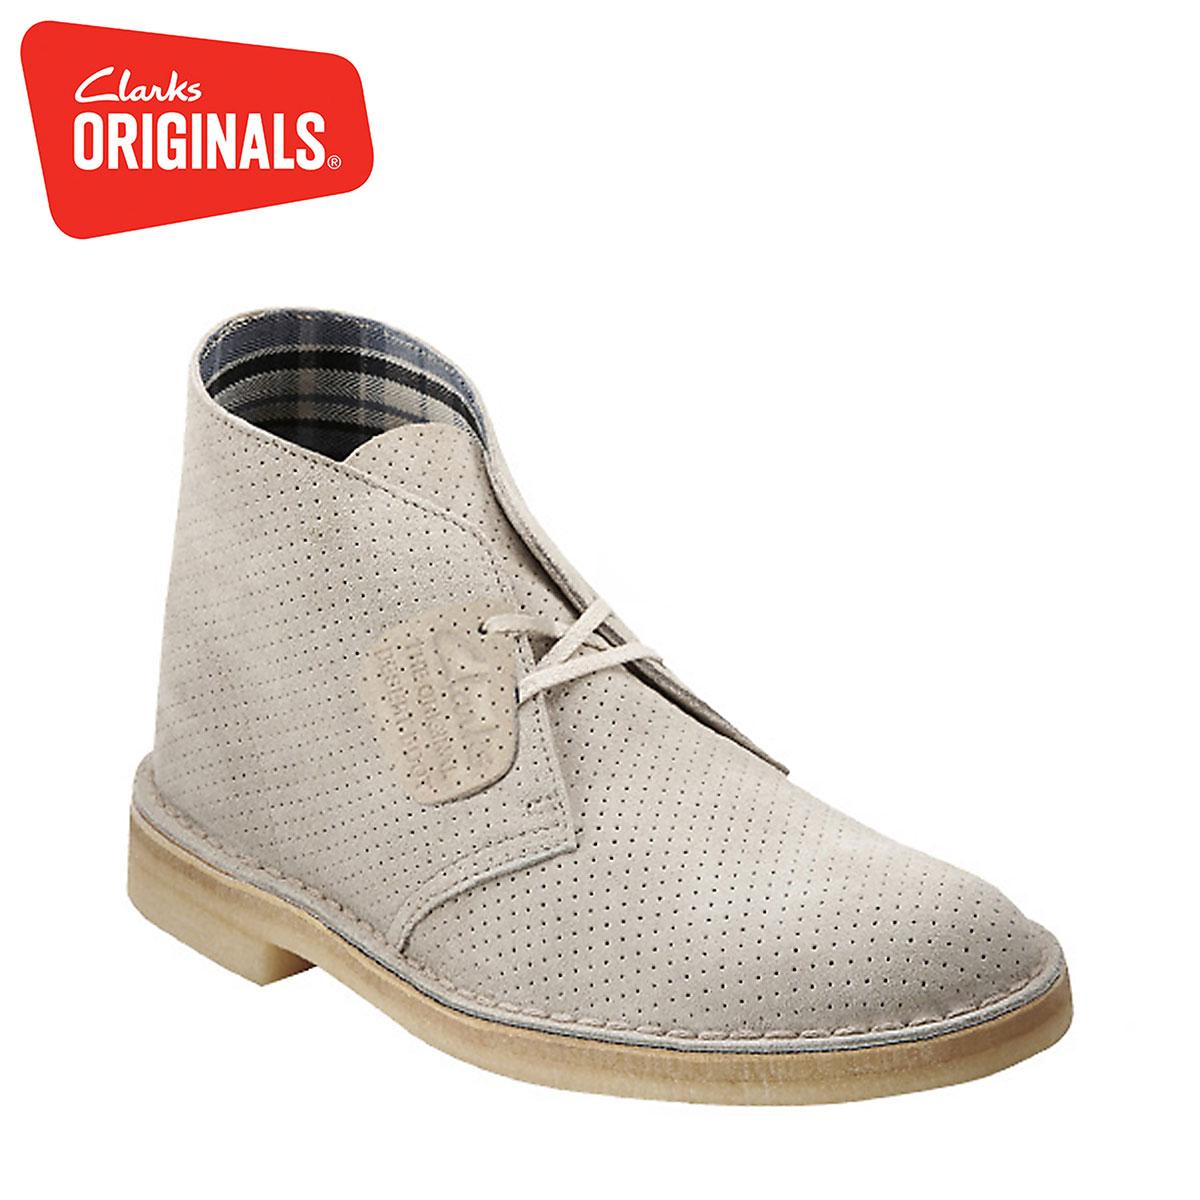 allsports clarks originals clarks originals desert boots in gray 61278 desert boot mens. Black Bedroom Furniture Sets. Home Design Ideas